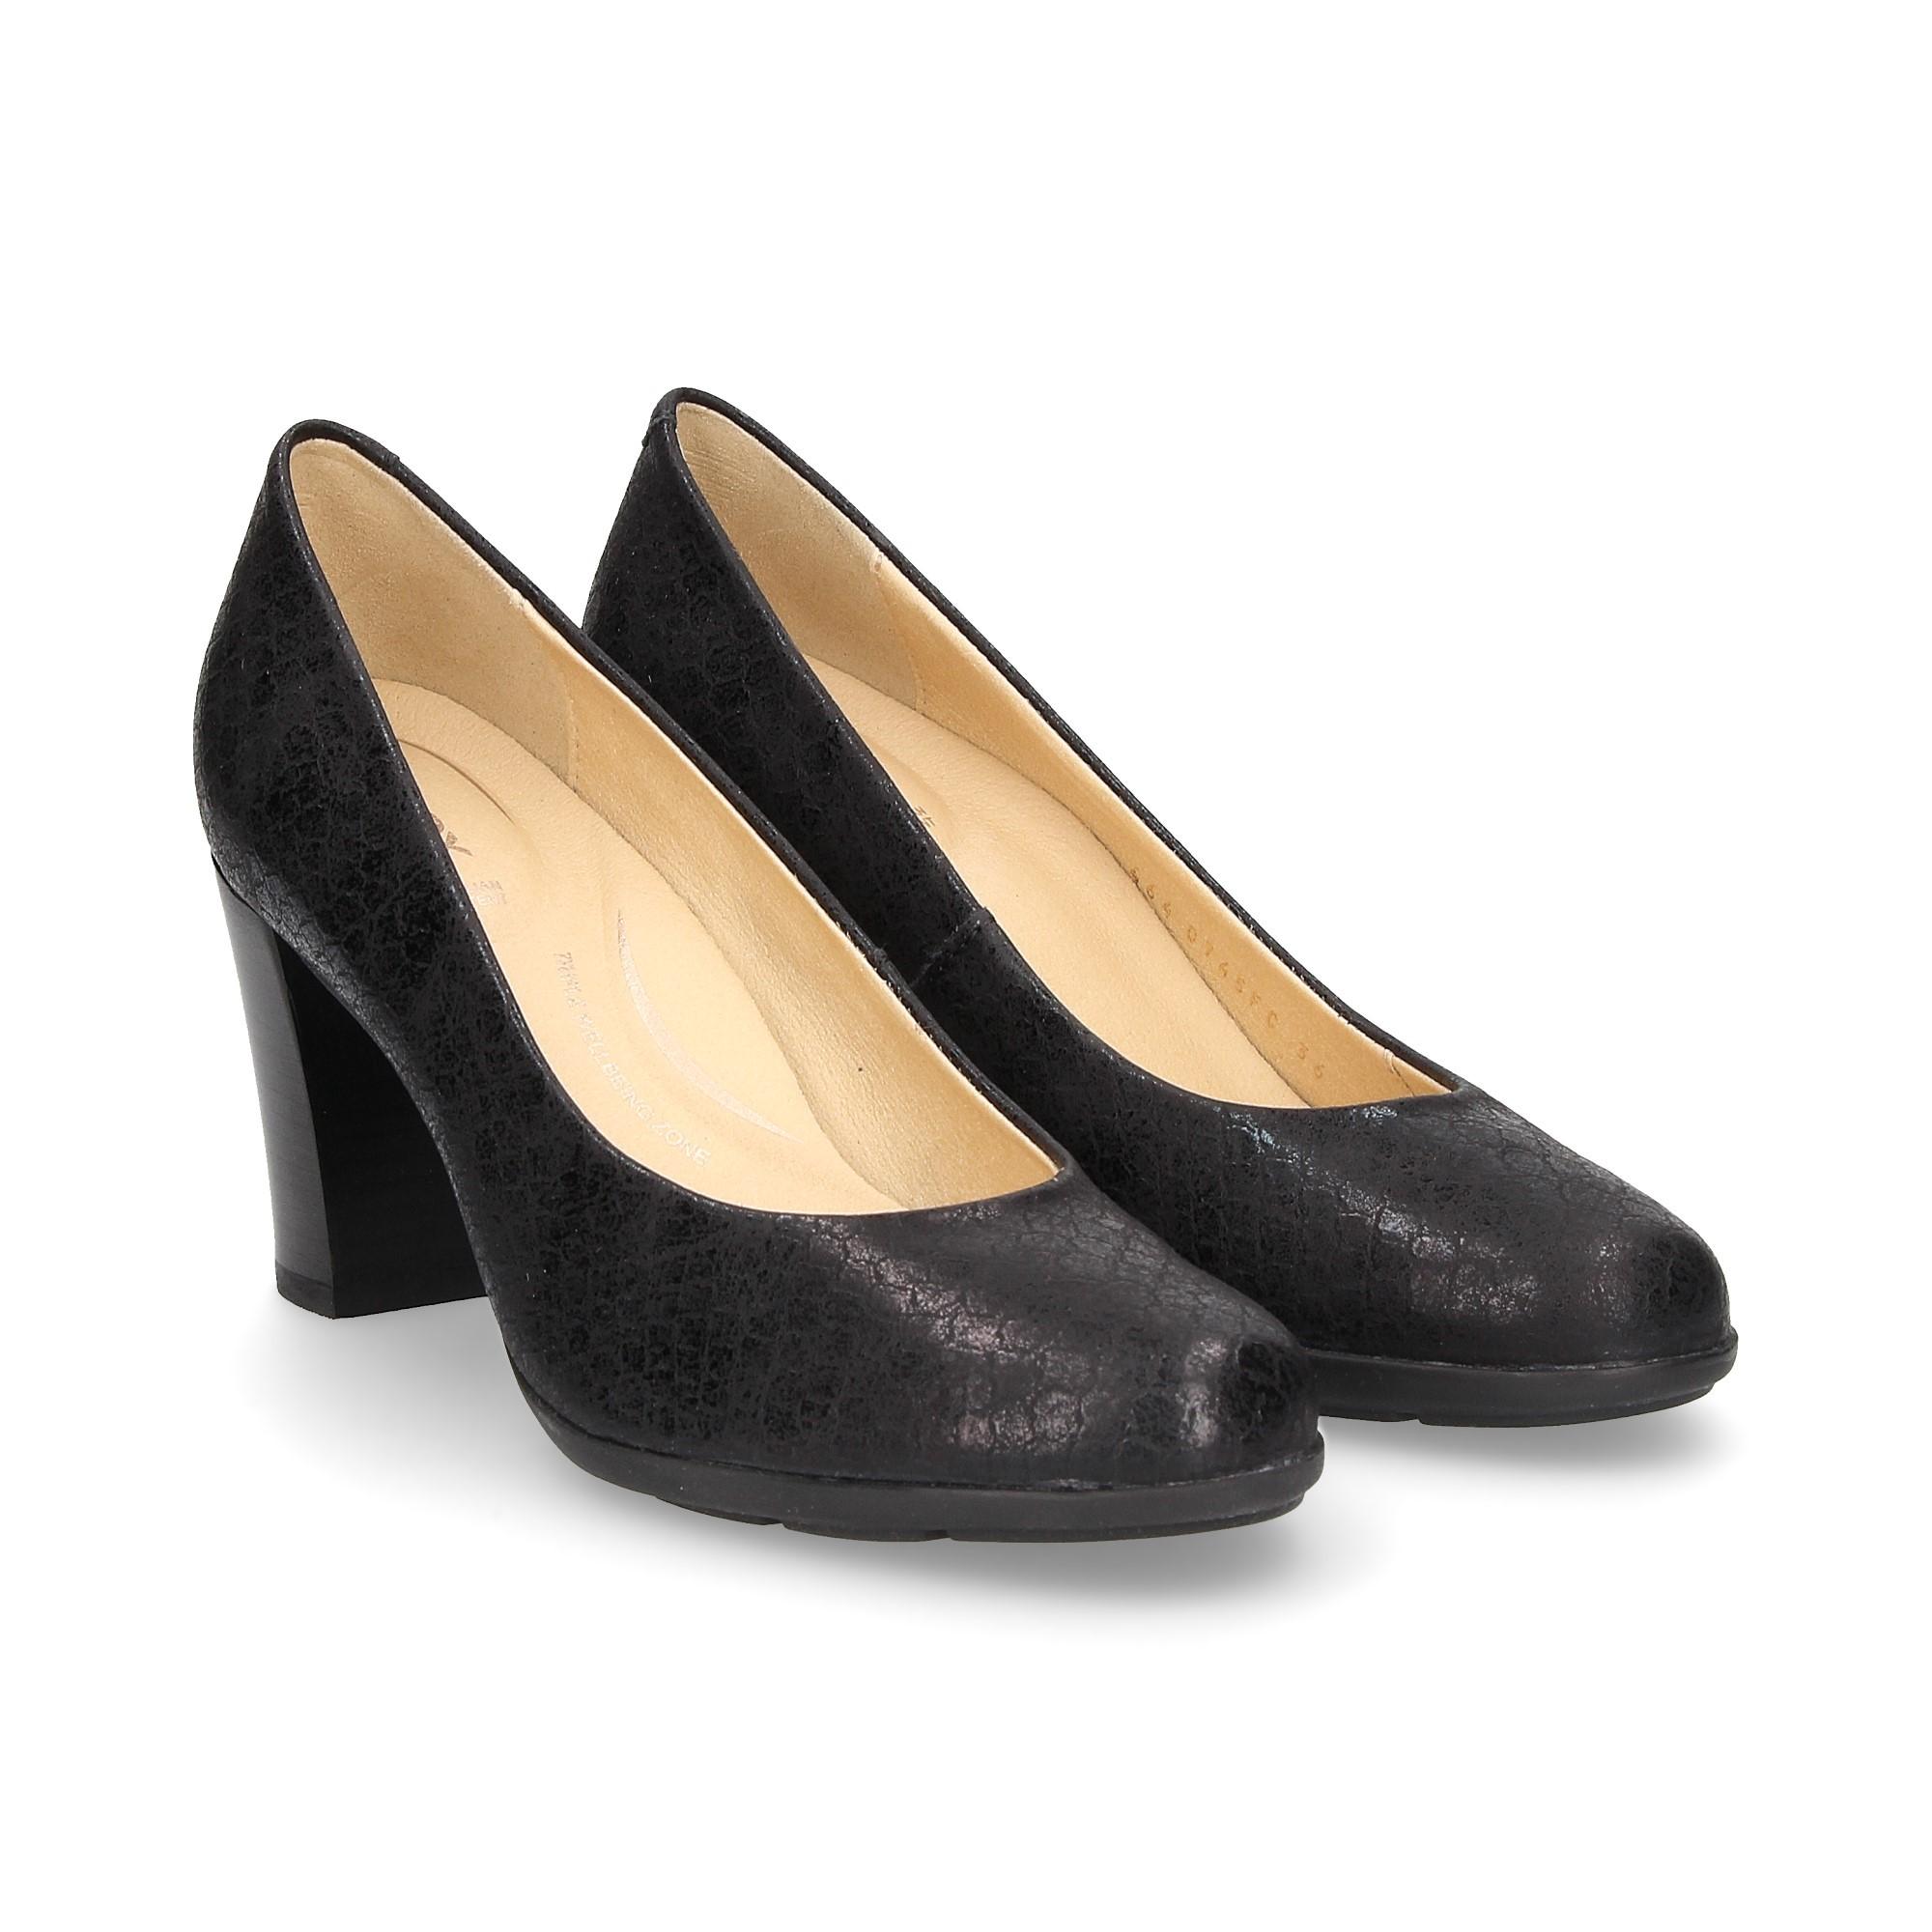 de C9999 GEOX NEGRO Zapatos salón D745FC 7S5xSwgqRF